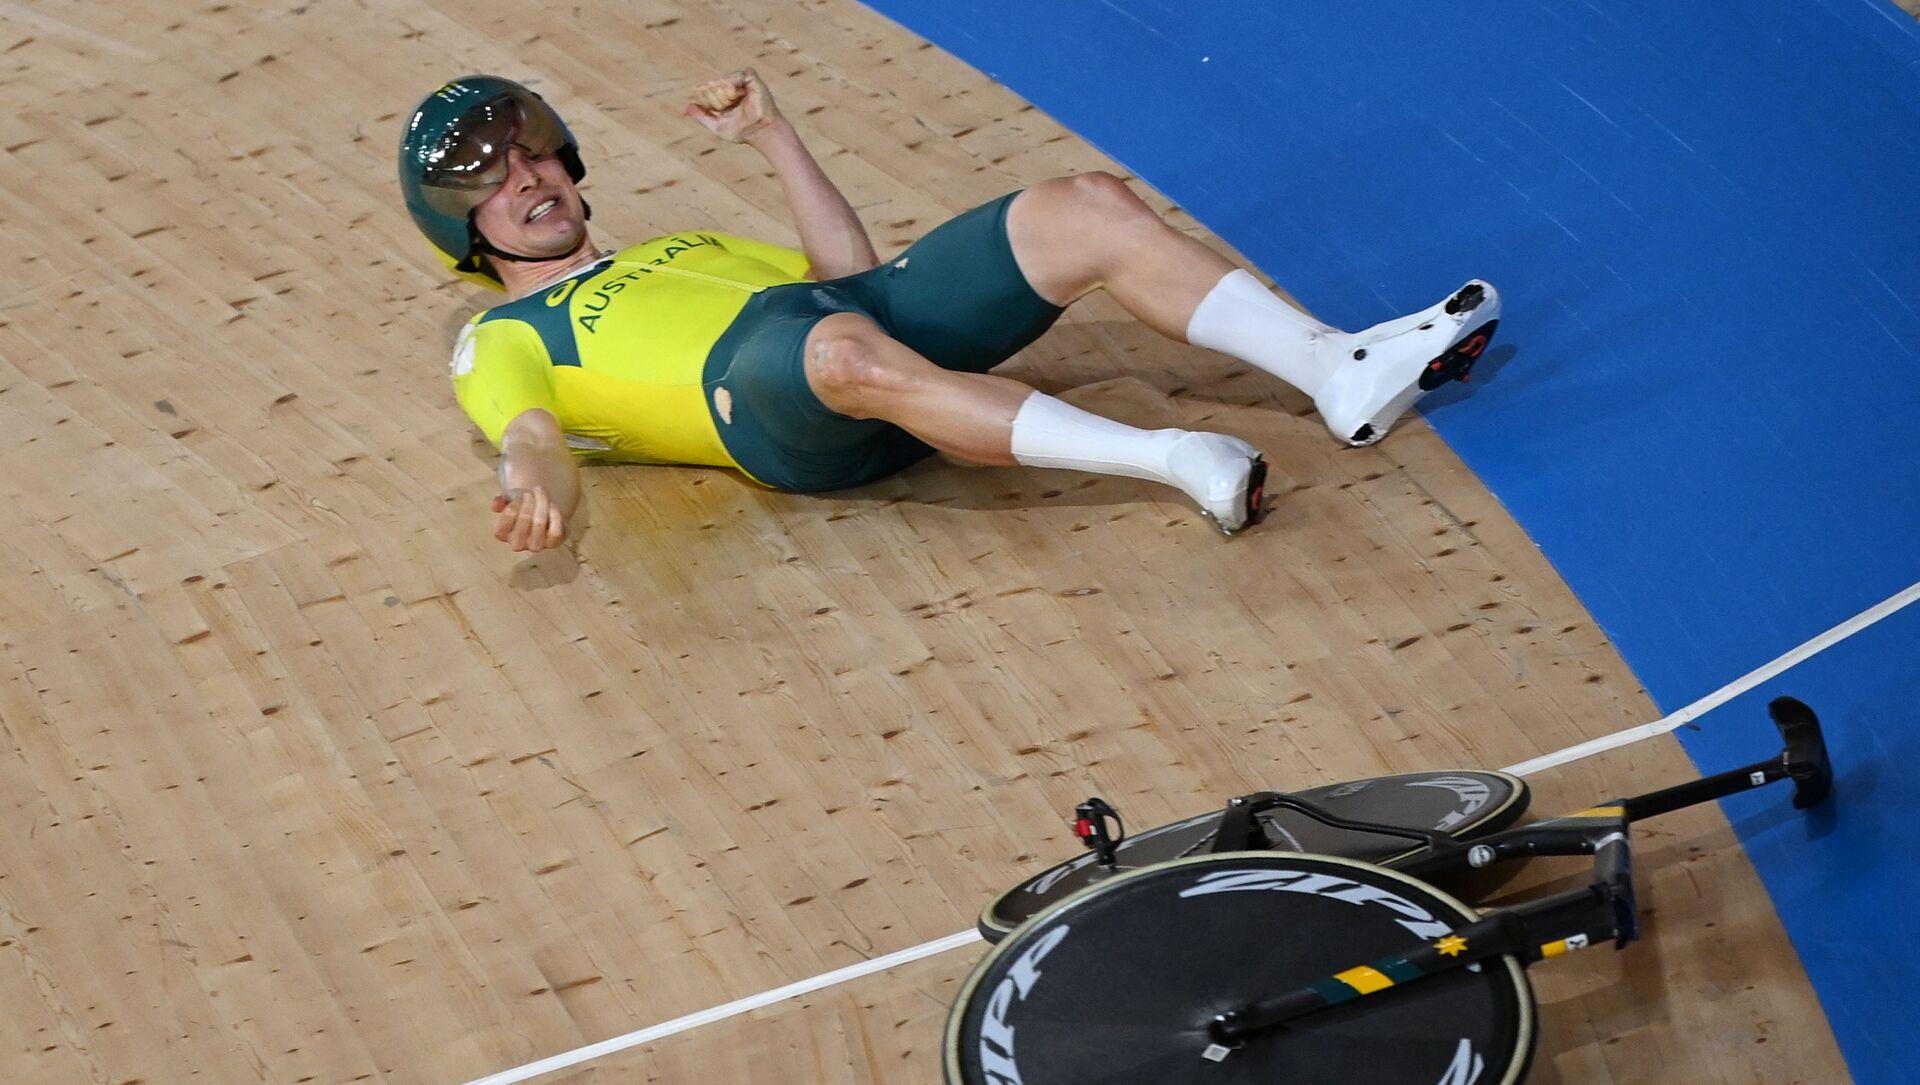 Australia's Alexander Porter reacts after crashing during the men's track cycling team pursuit qualifying event during the Tokyo 2020 Olympic Games at Izu Velodrome in Izu, Japan, on 2 August 2021. - Sputnik International, 1920, 02.08.2021